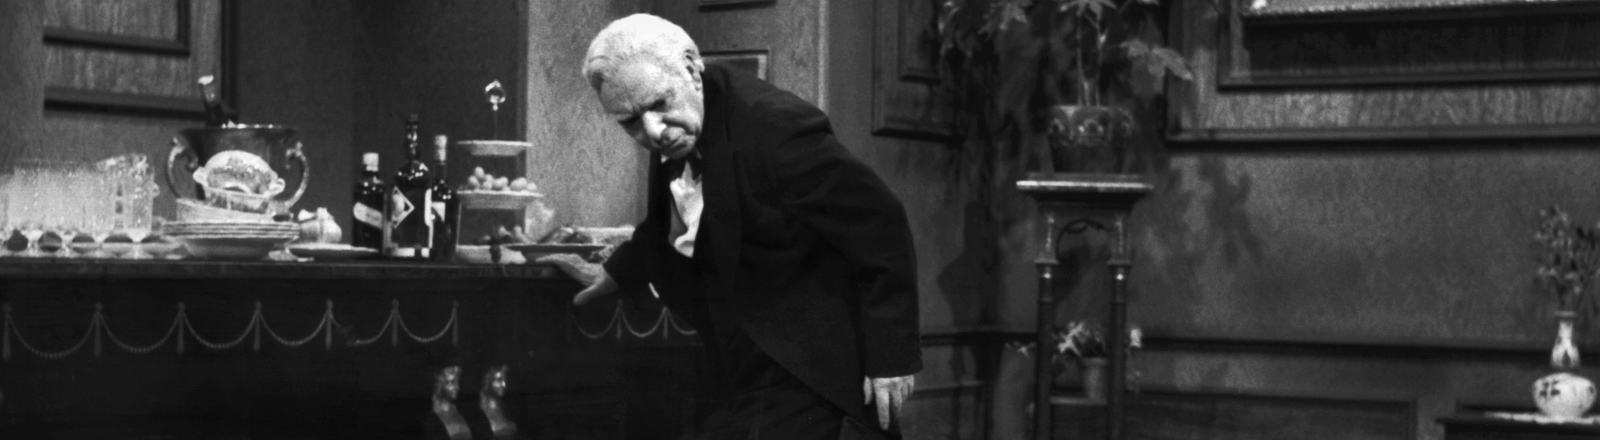 "Freddie Frinton spielt den Butler James in ""Dinner for One""."